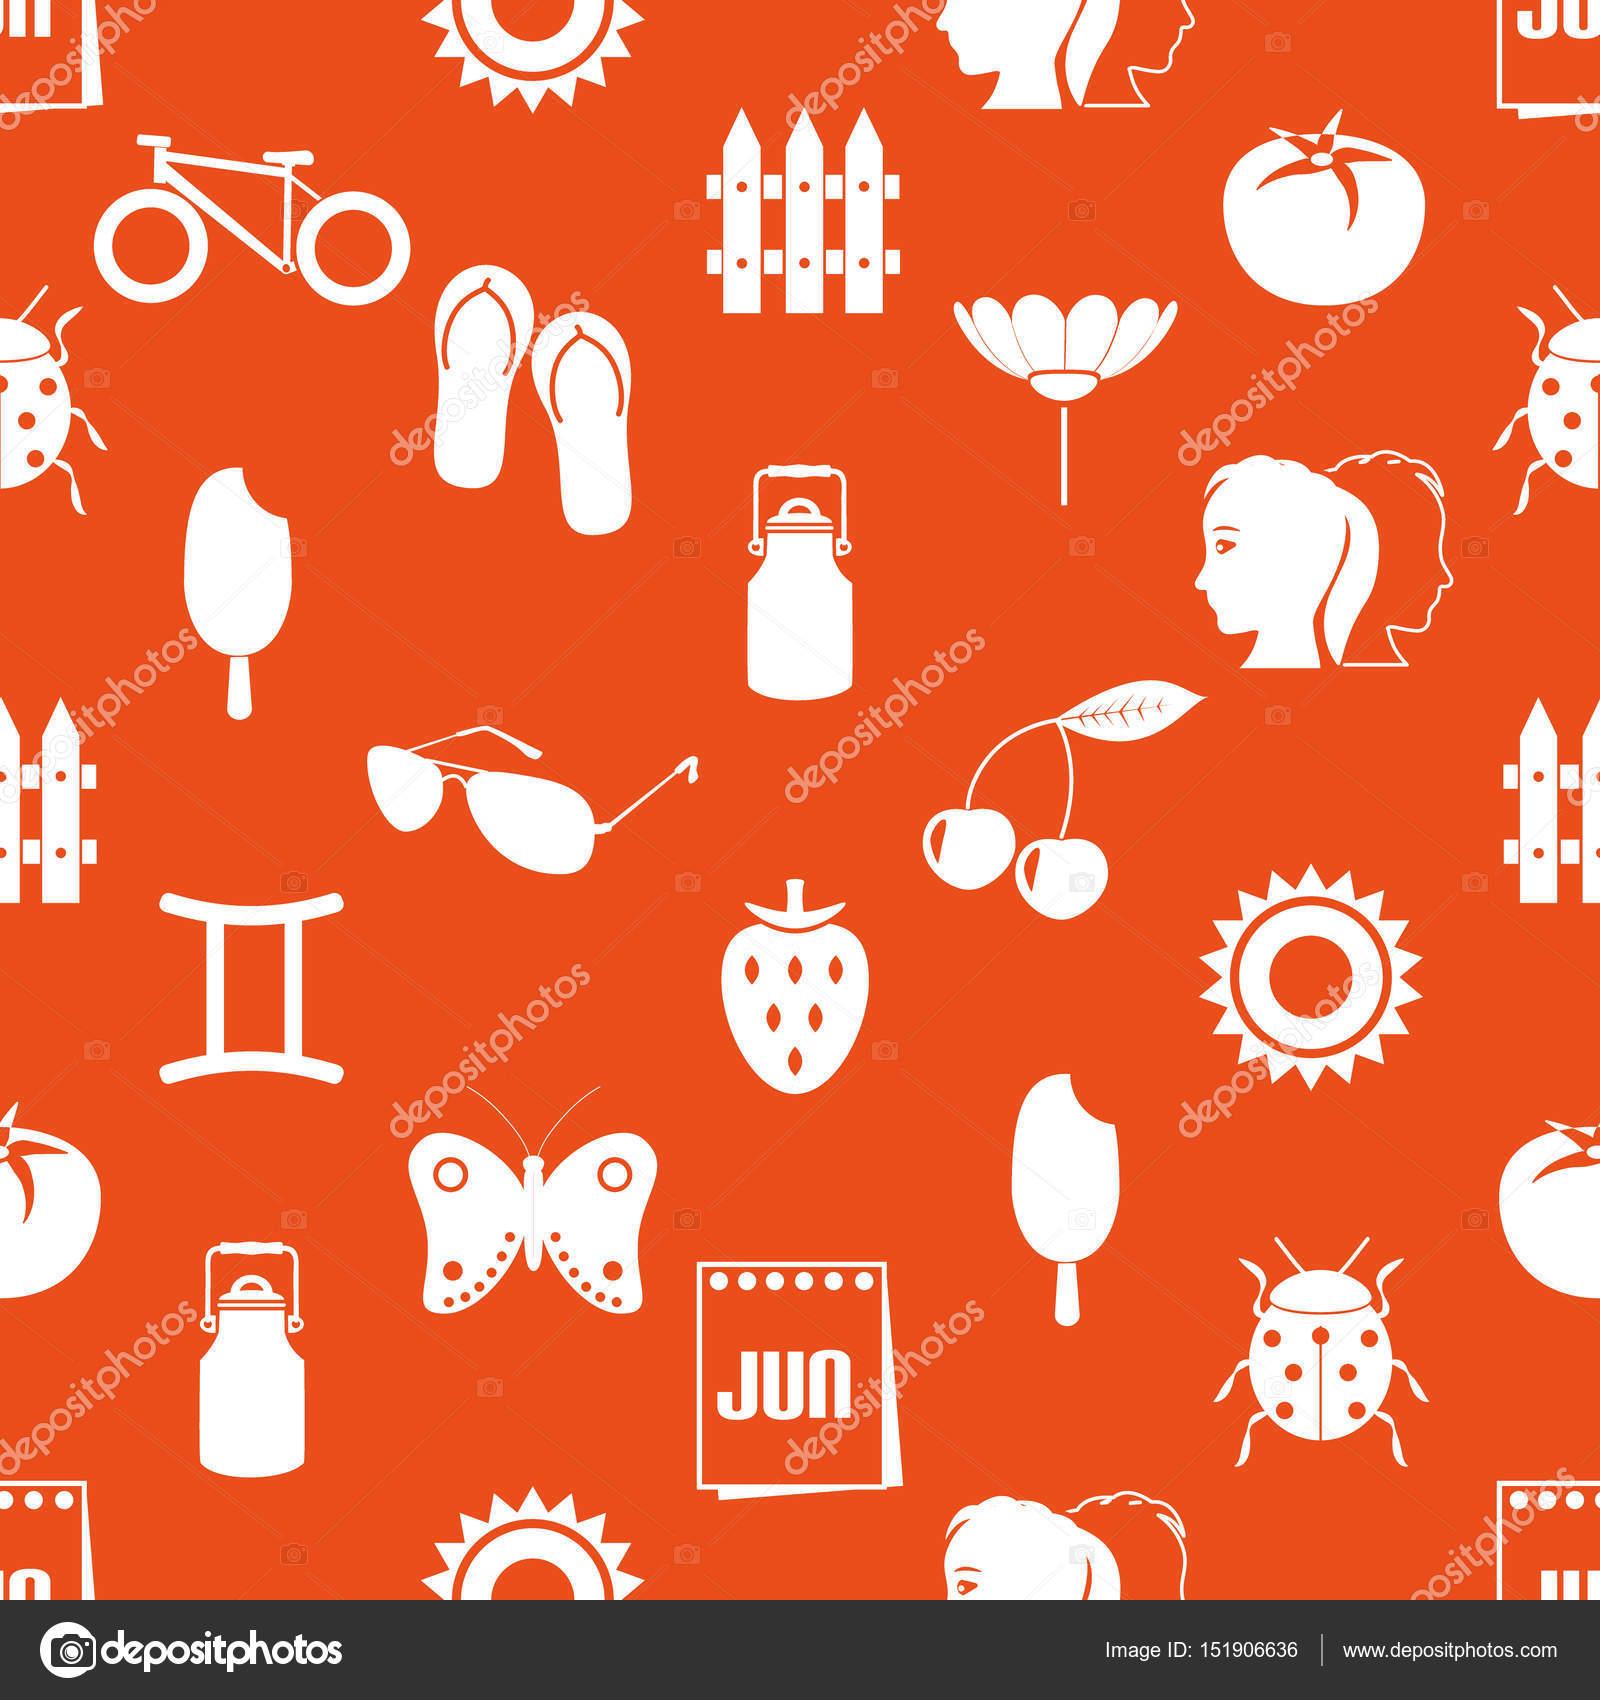 Thema Juni Monat Satz einfache Symbole Musterdesign eps10 ...